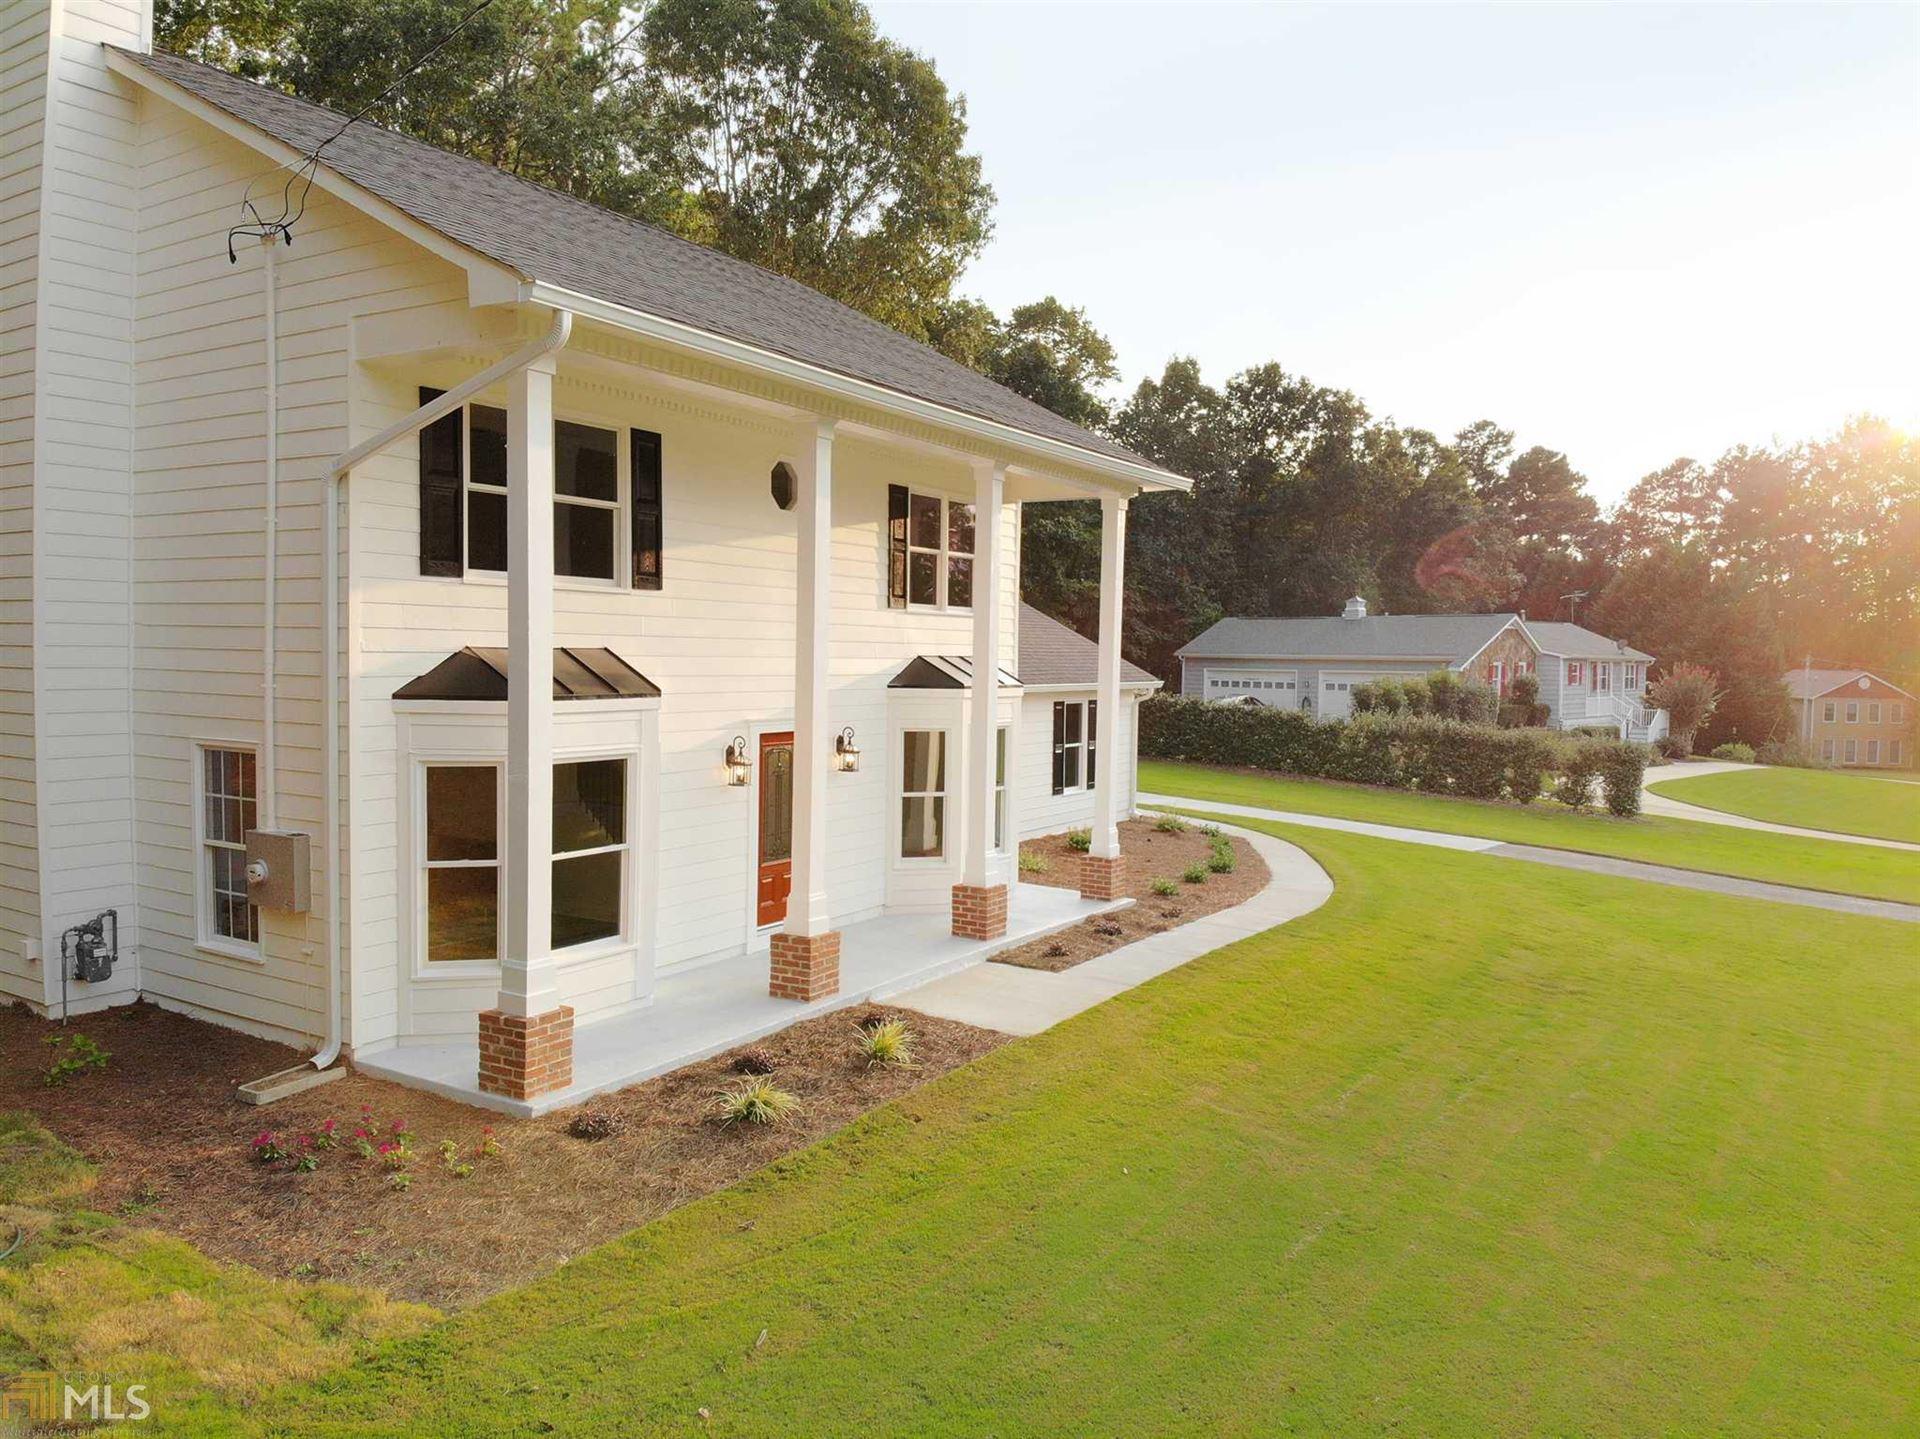 190 Heritage Farm Ln, Fayetteville, GA 30215 - #: 8855390